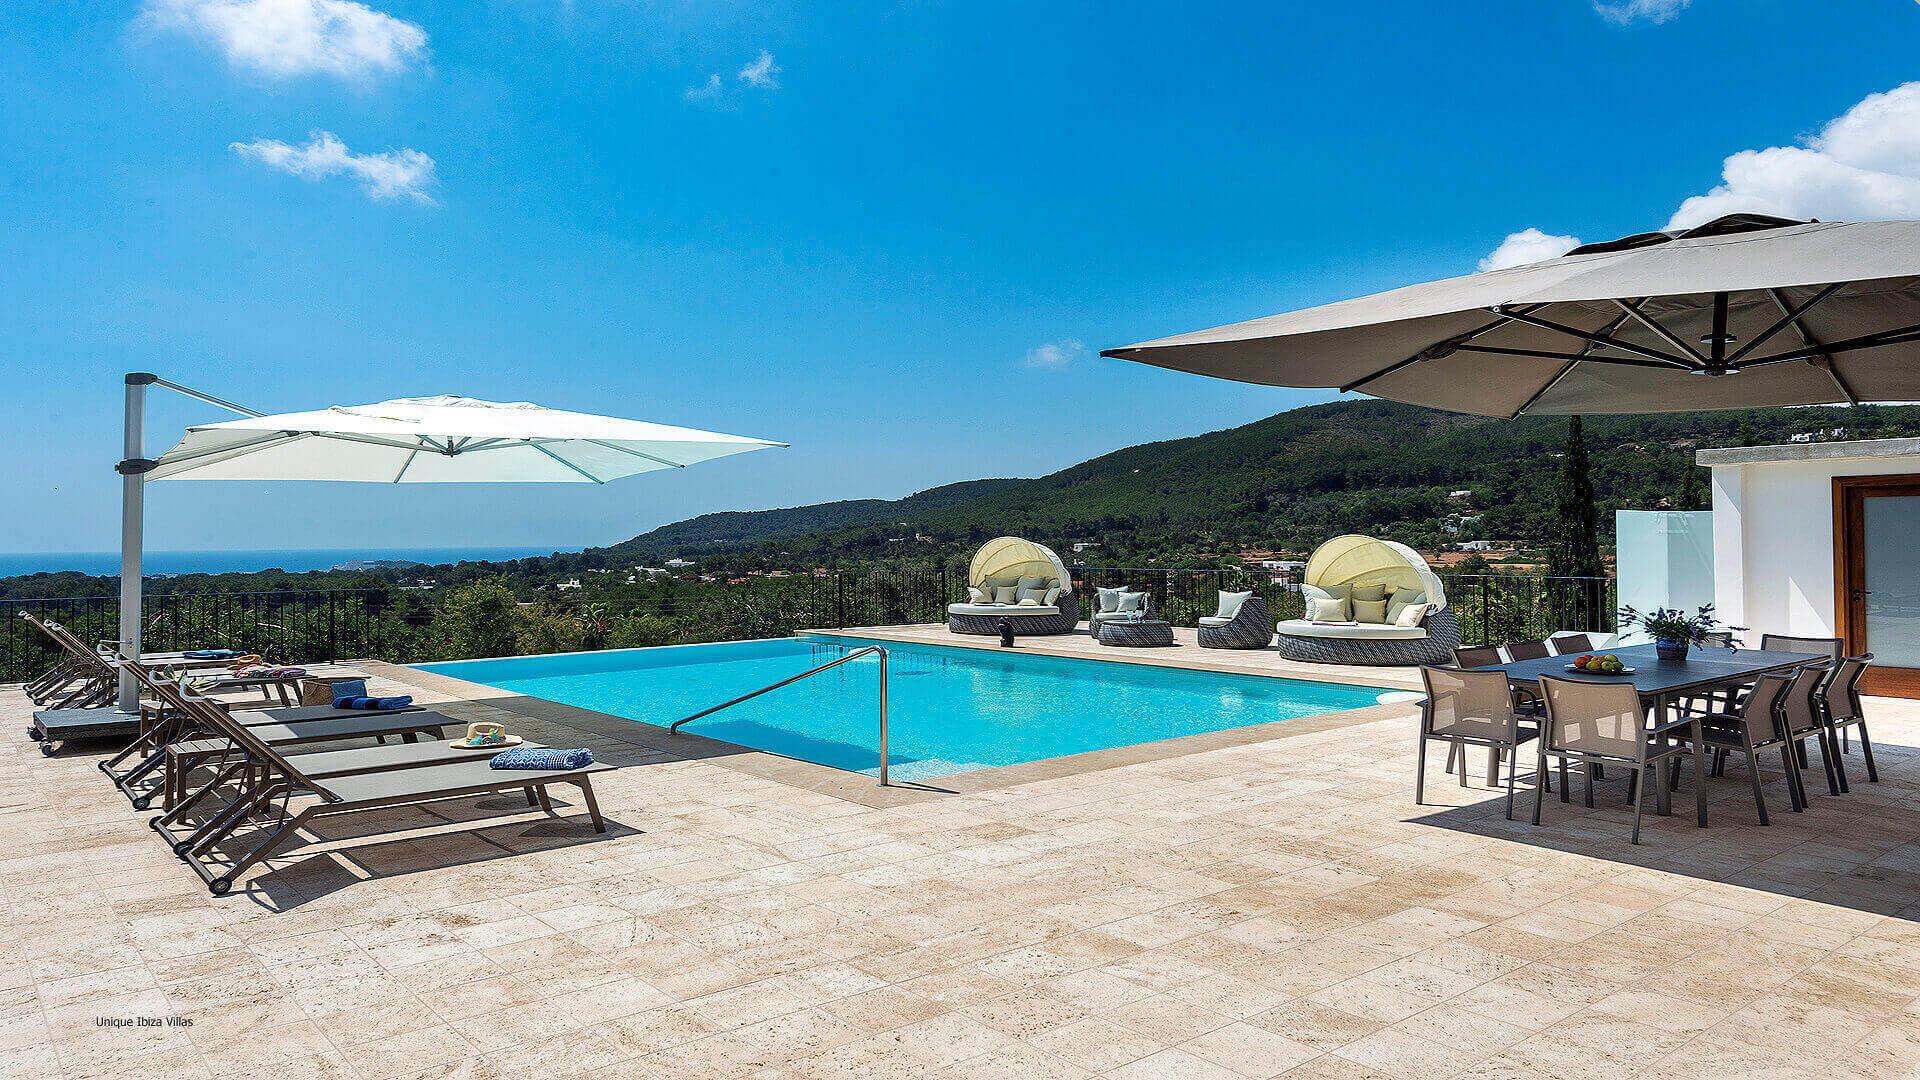 Casa Prats Ibiza 12 Santa Eulalia